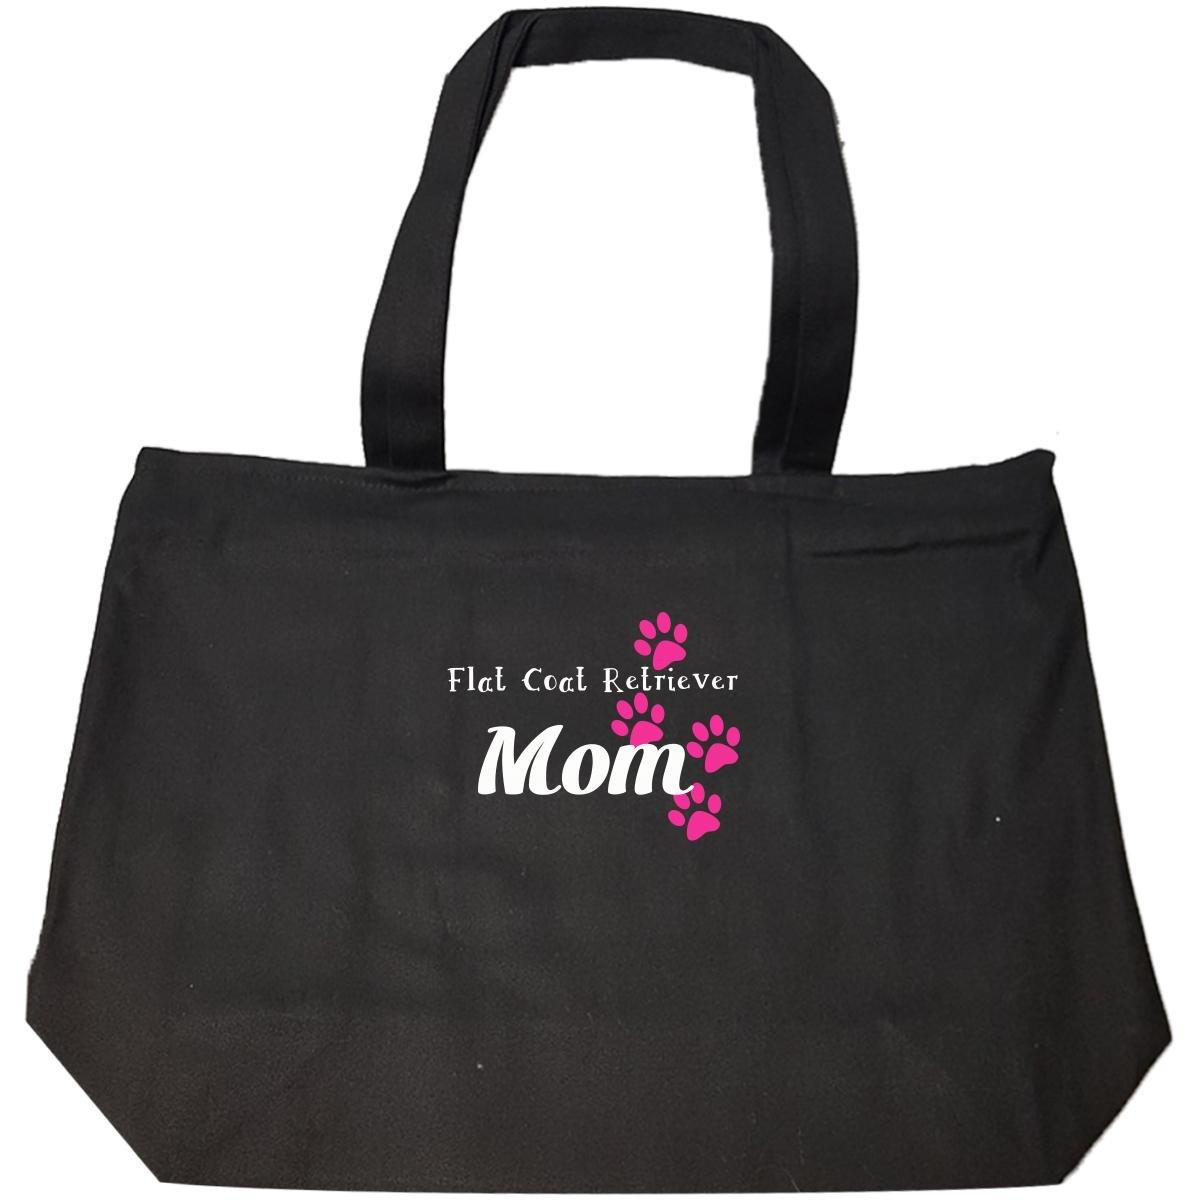 Flat Coat Retriever Mom I Love My Flat Coat Retriever Dog - Tote Bag With Zip